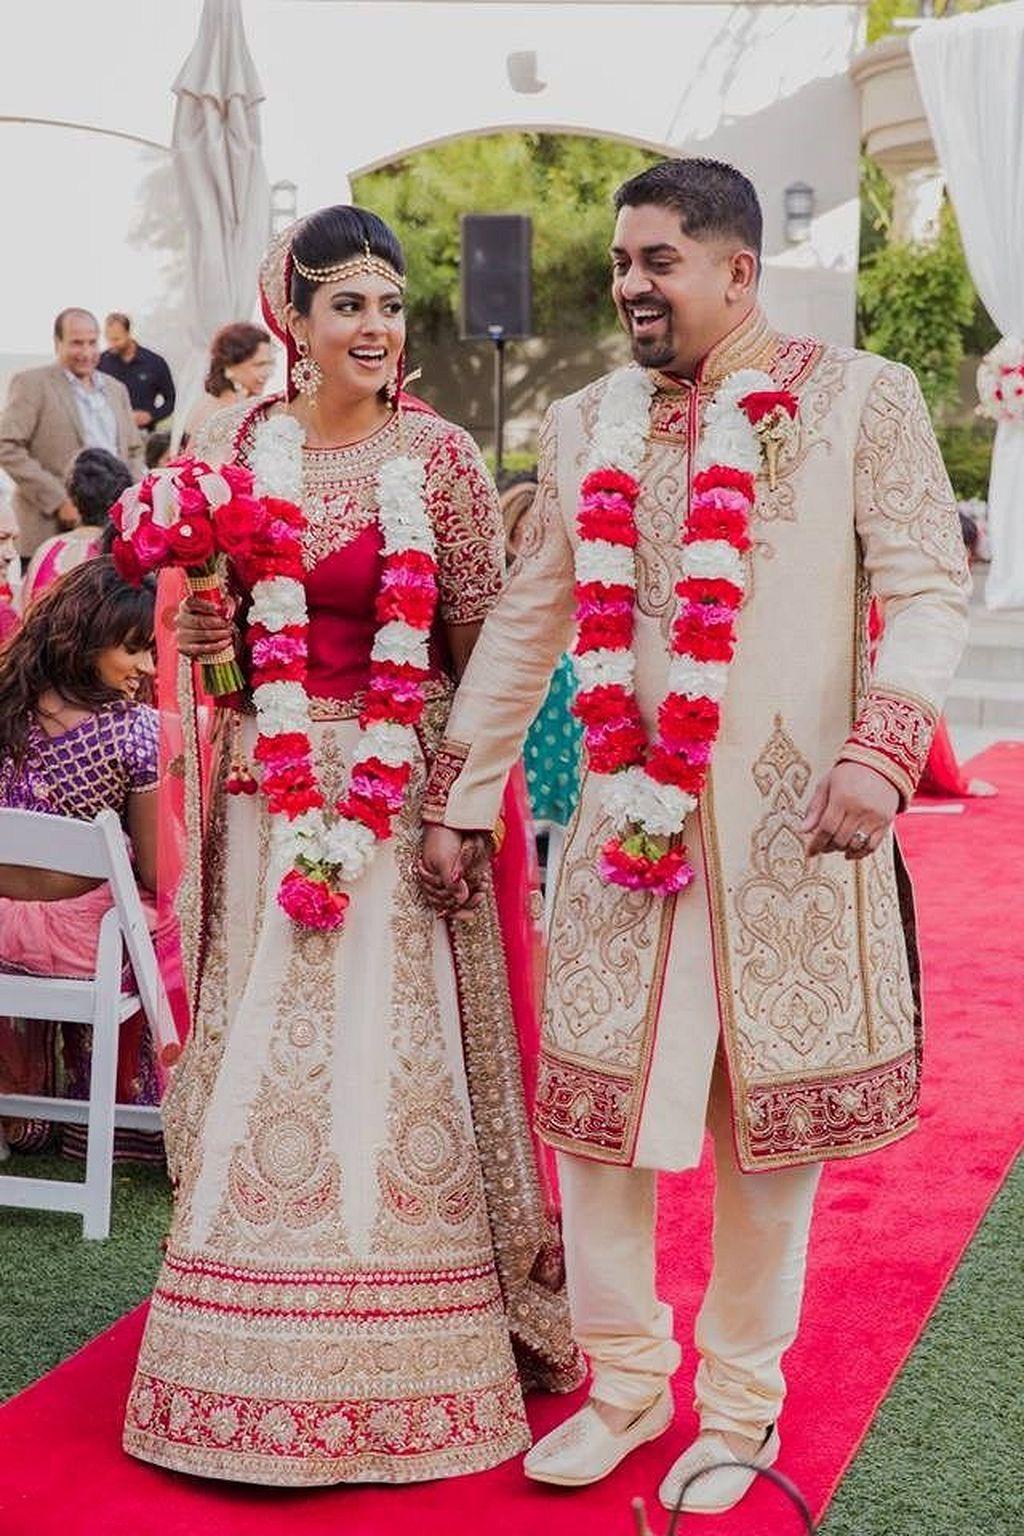 30+ Beautiful Indian Wedding Reception Ideas | Indian wedding ...